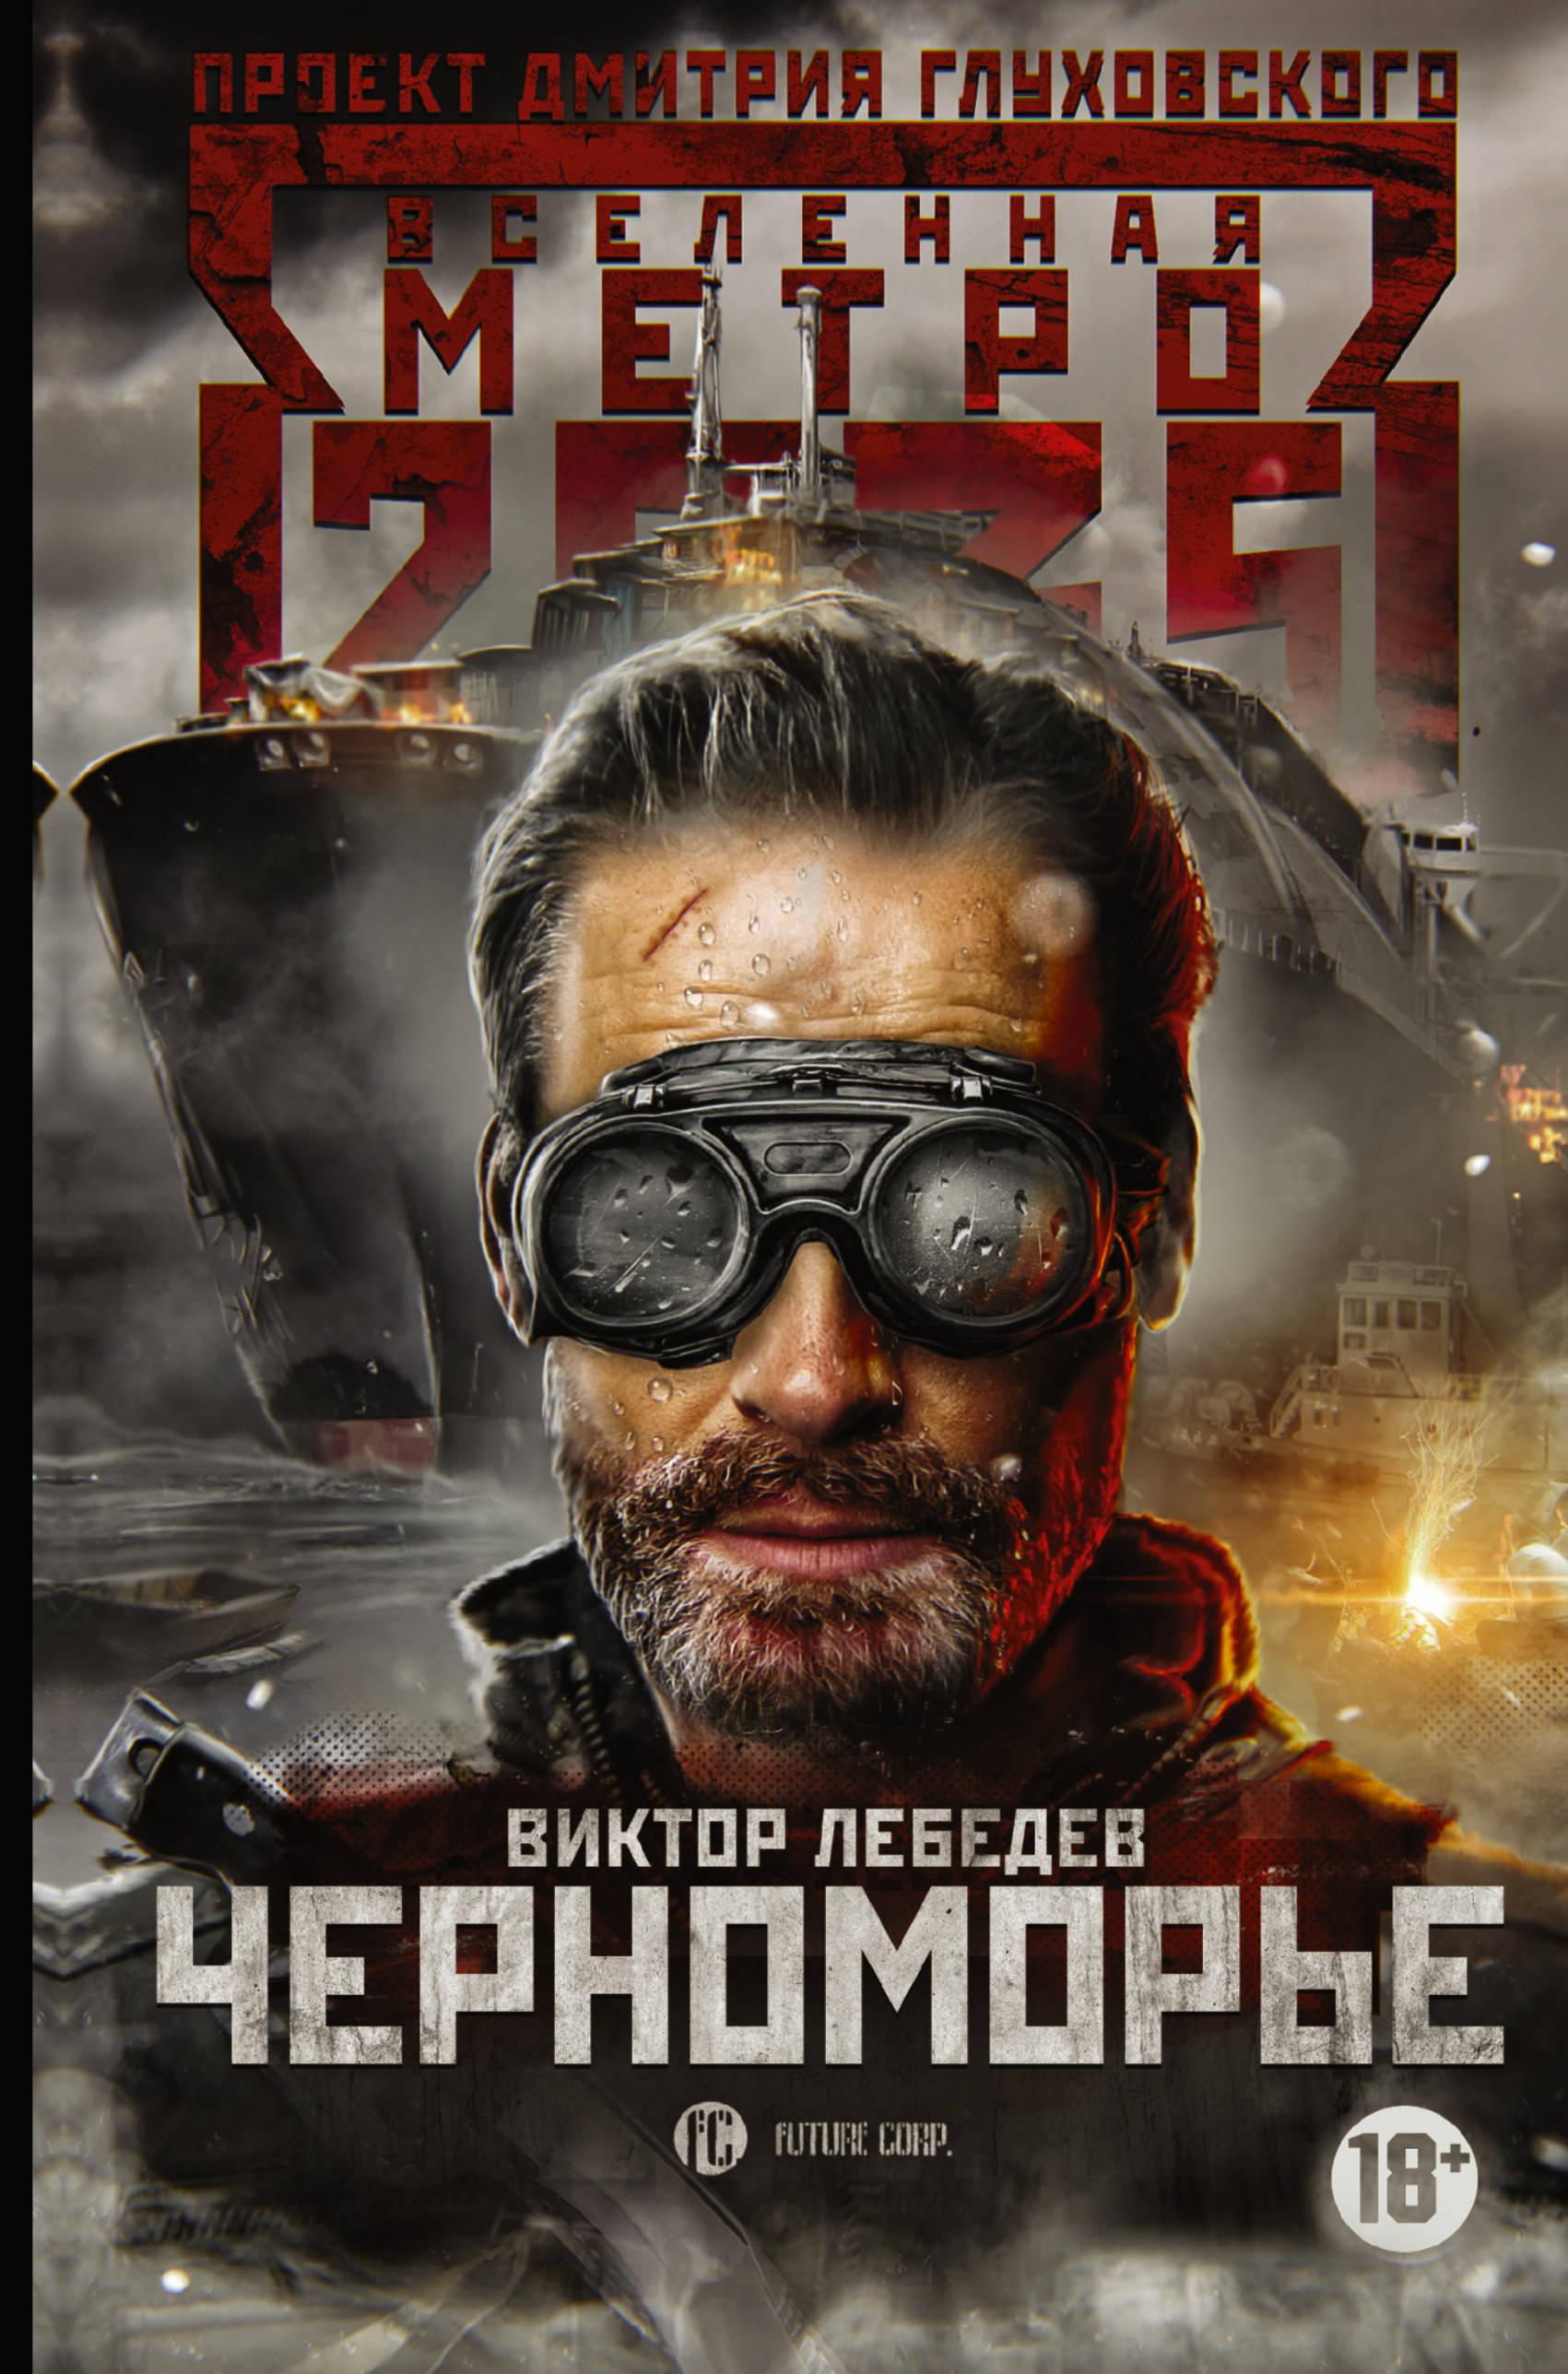 Виктор Лебедев Метро 2035: Черноморье виктор лебедев метро 2035 черноморье